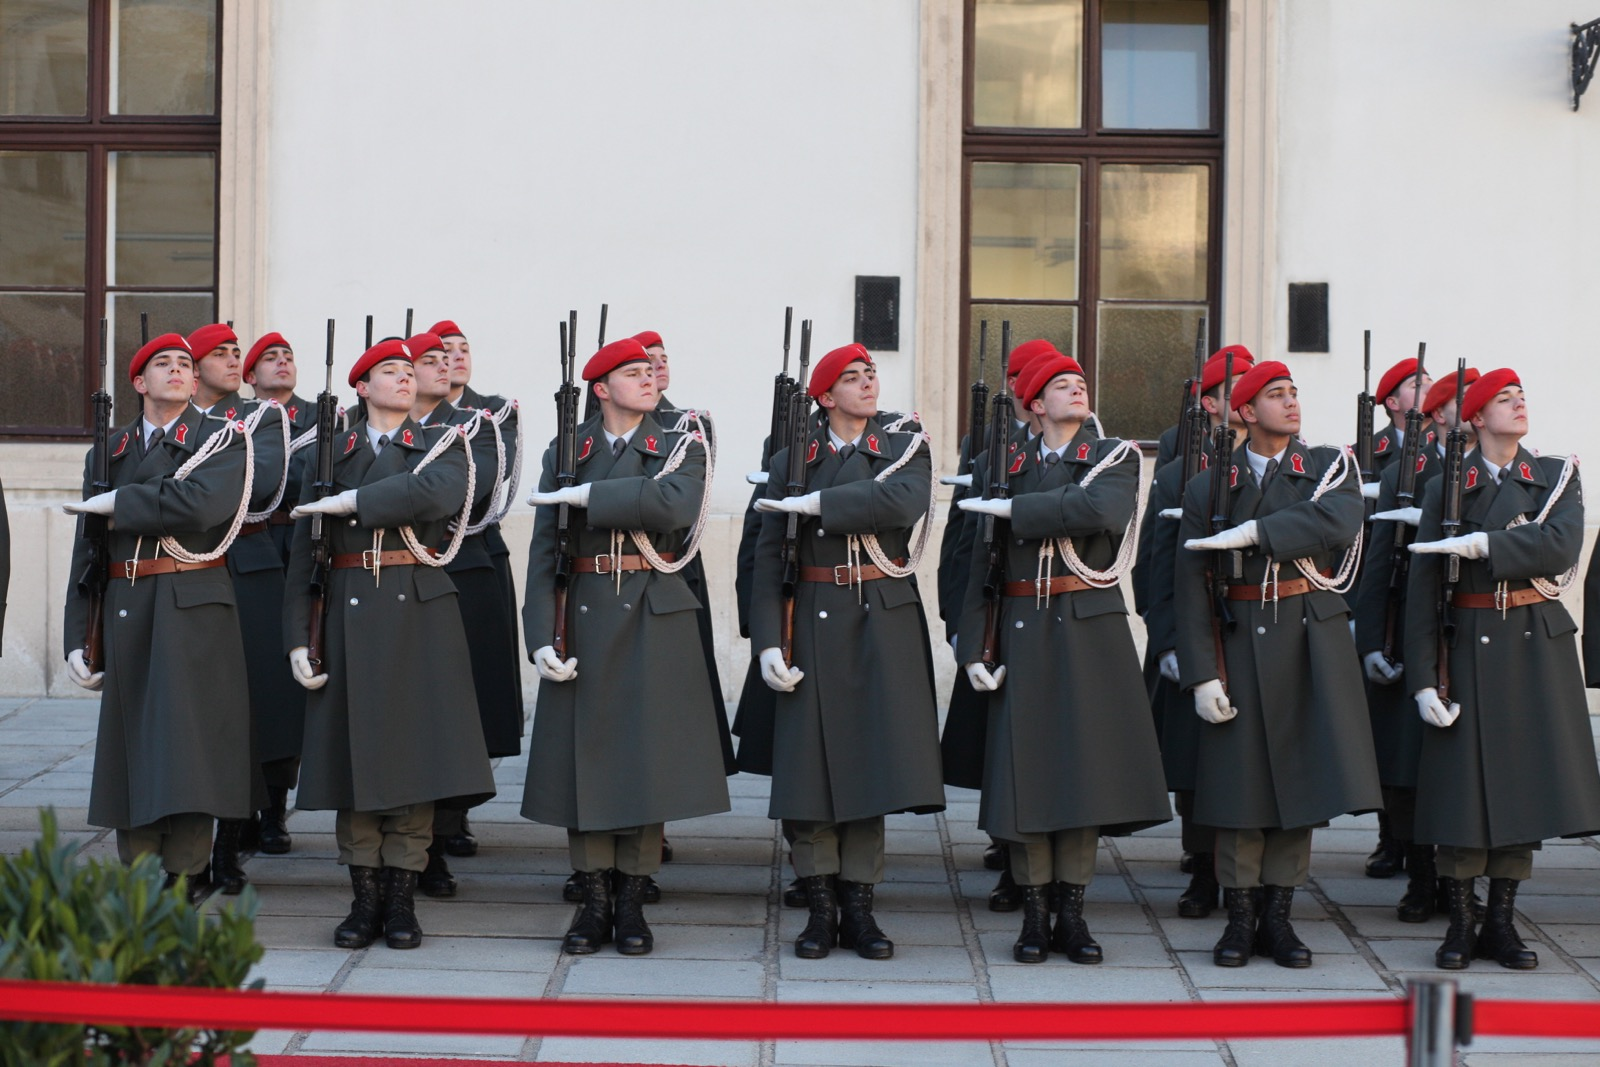 2019_01_11_1Gardekompanie_HBP_SUI_Präsident_Schweiz_Burghof - 31 of 36